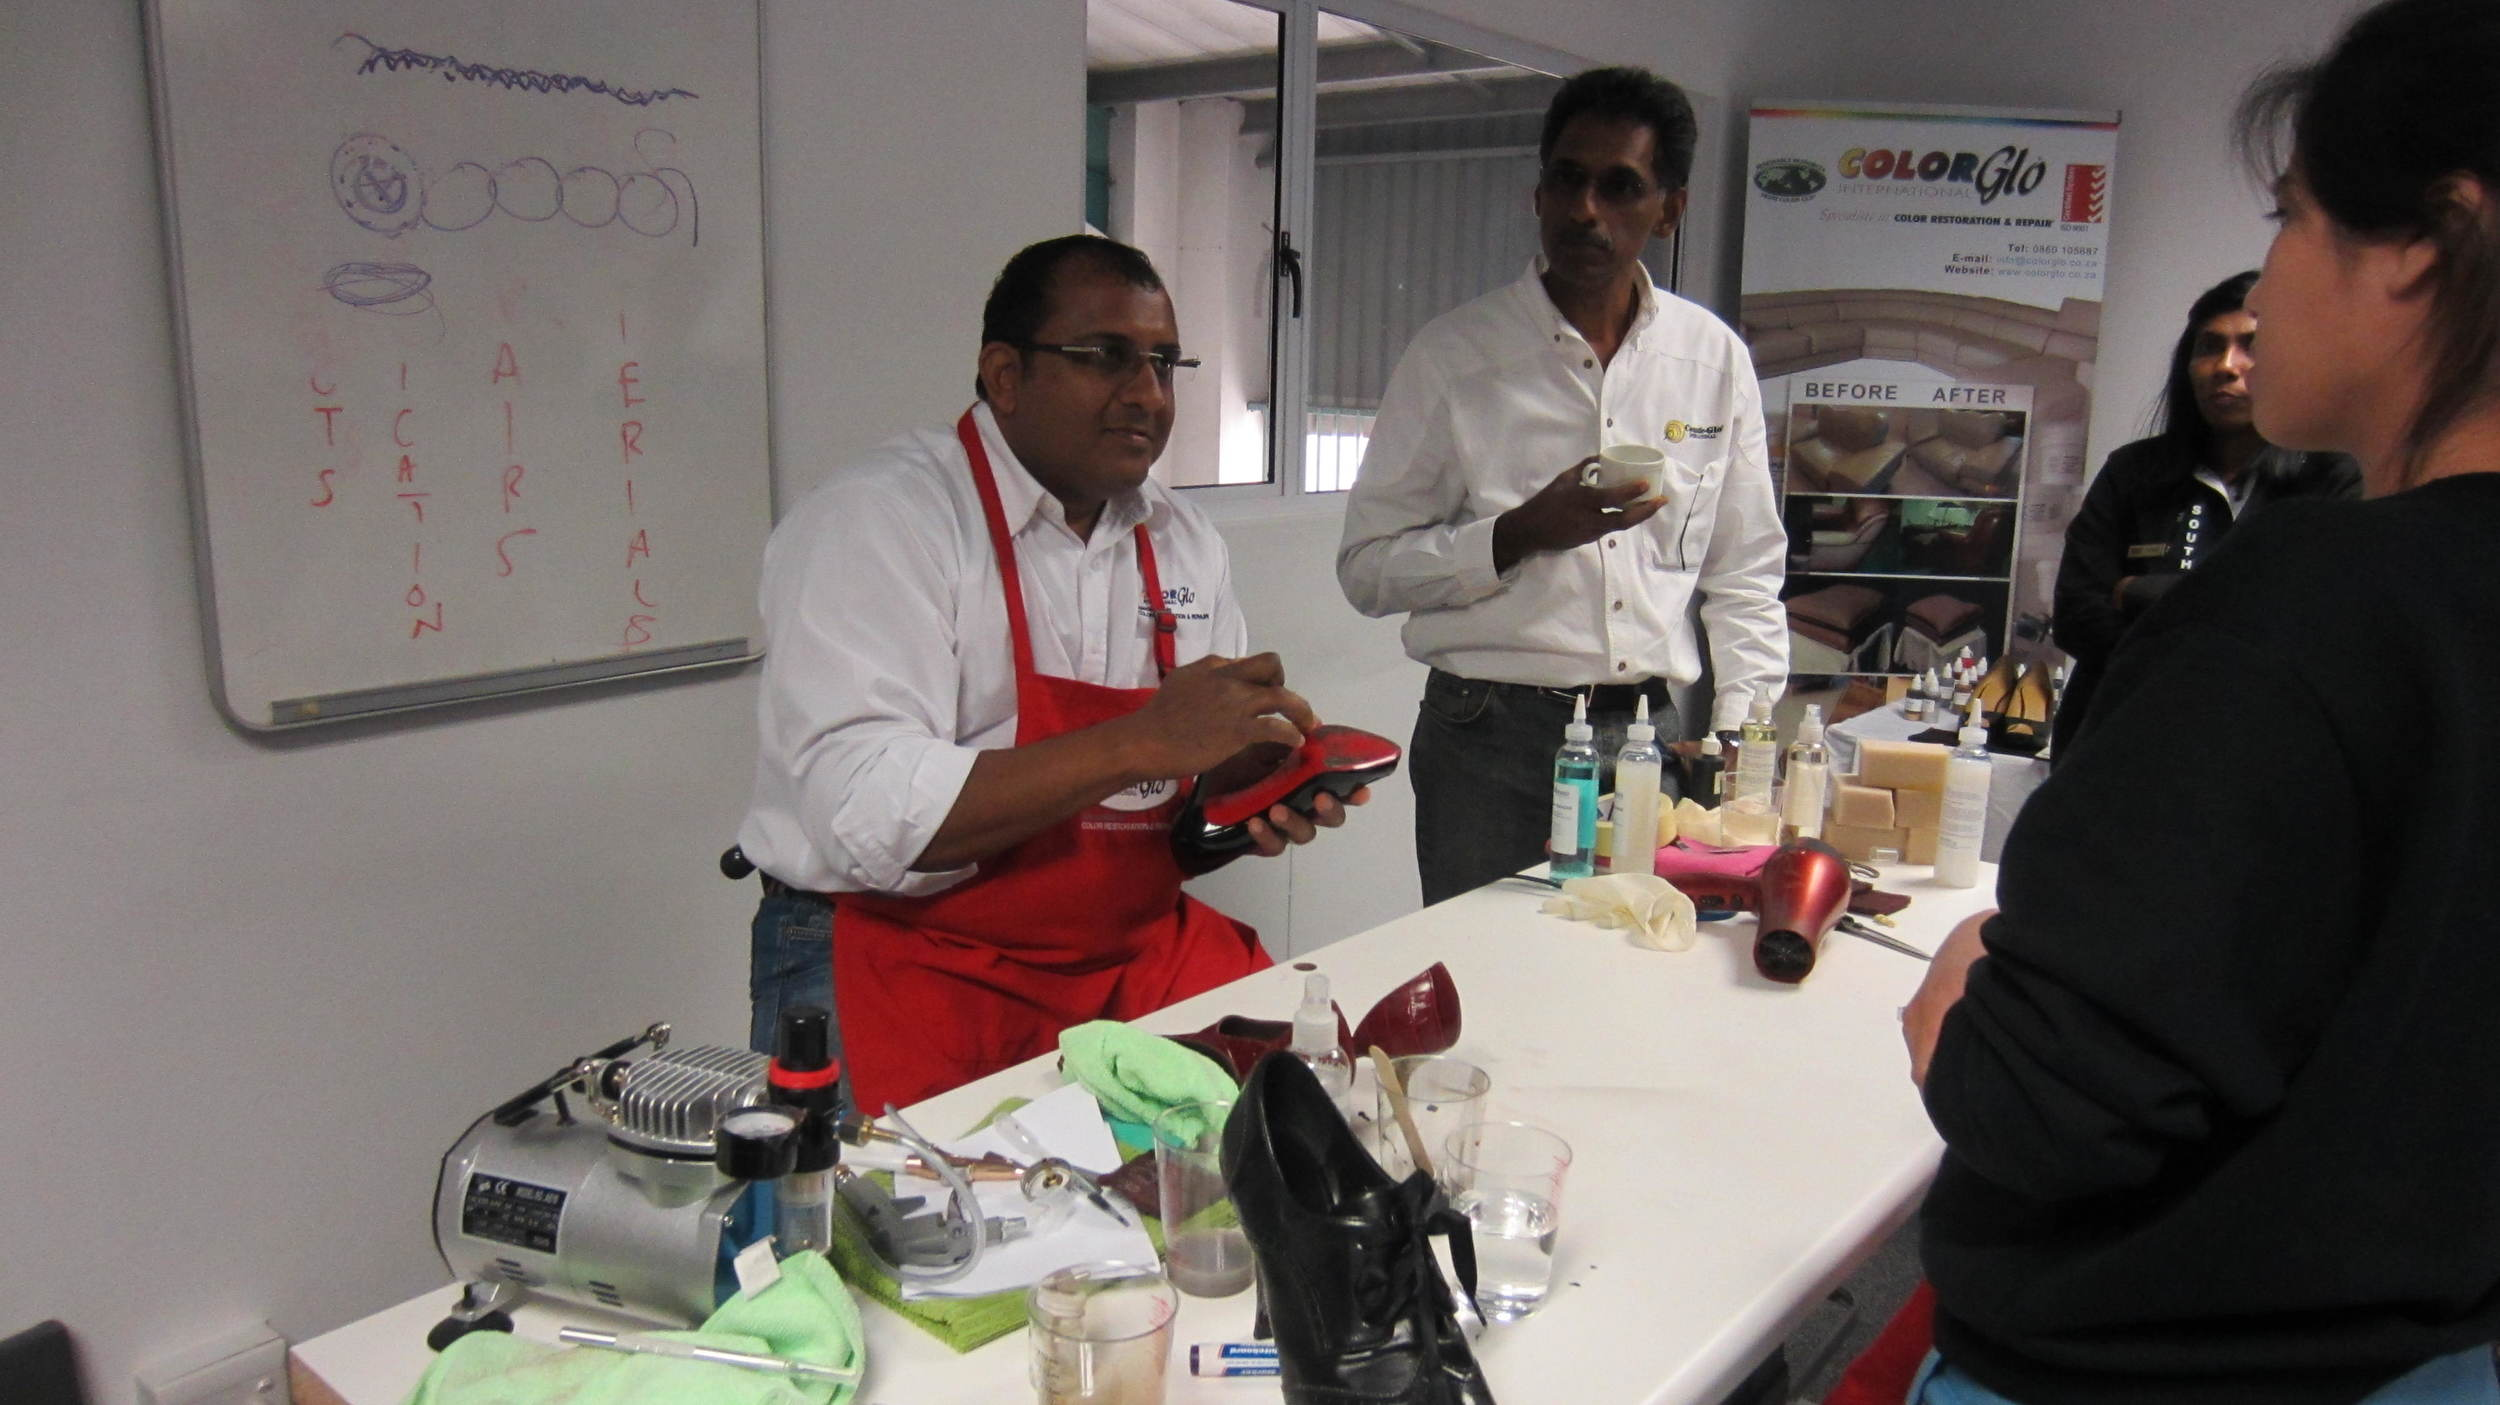 Ruben doing a shoe repair demonstration